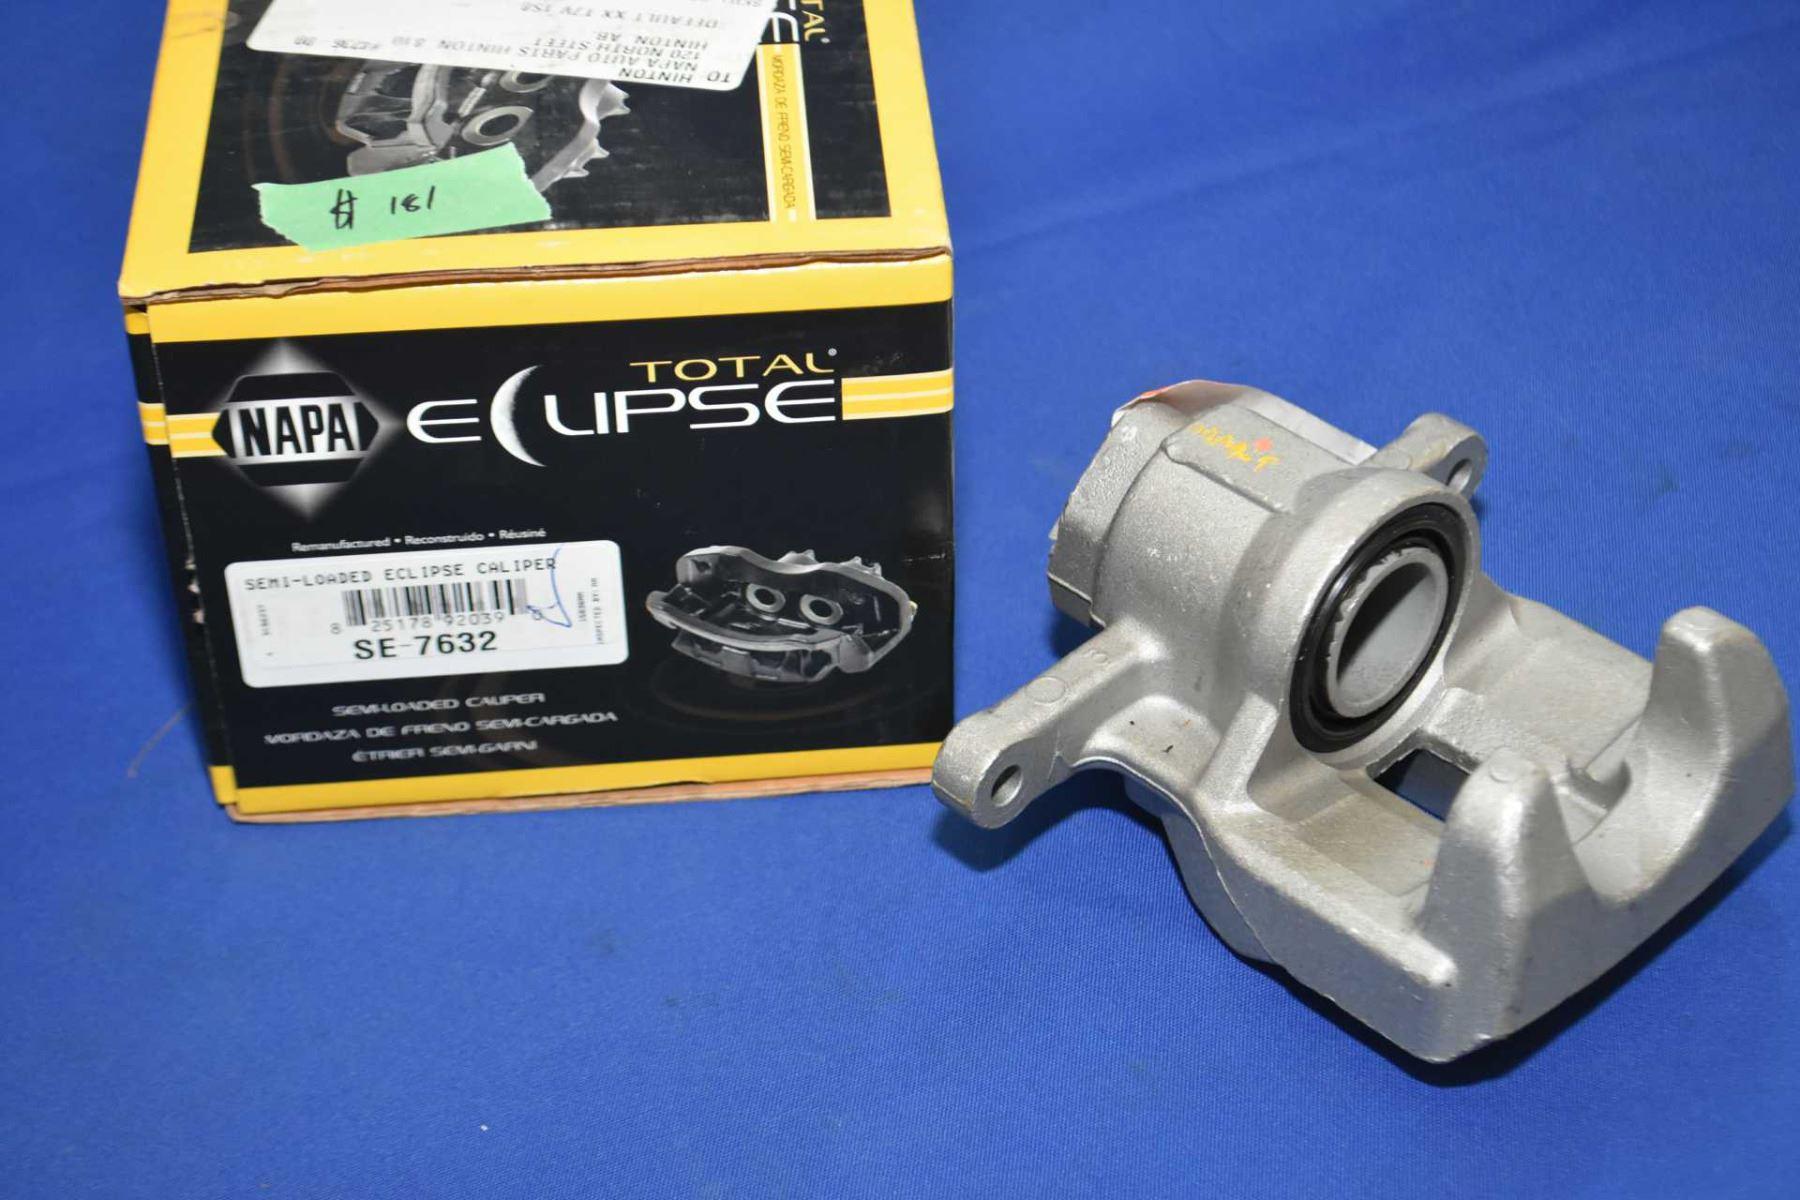 New Napa inventory disc brake caliper #SE-7632 (retails